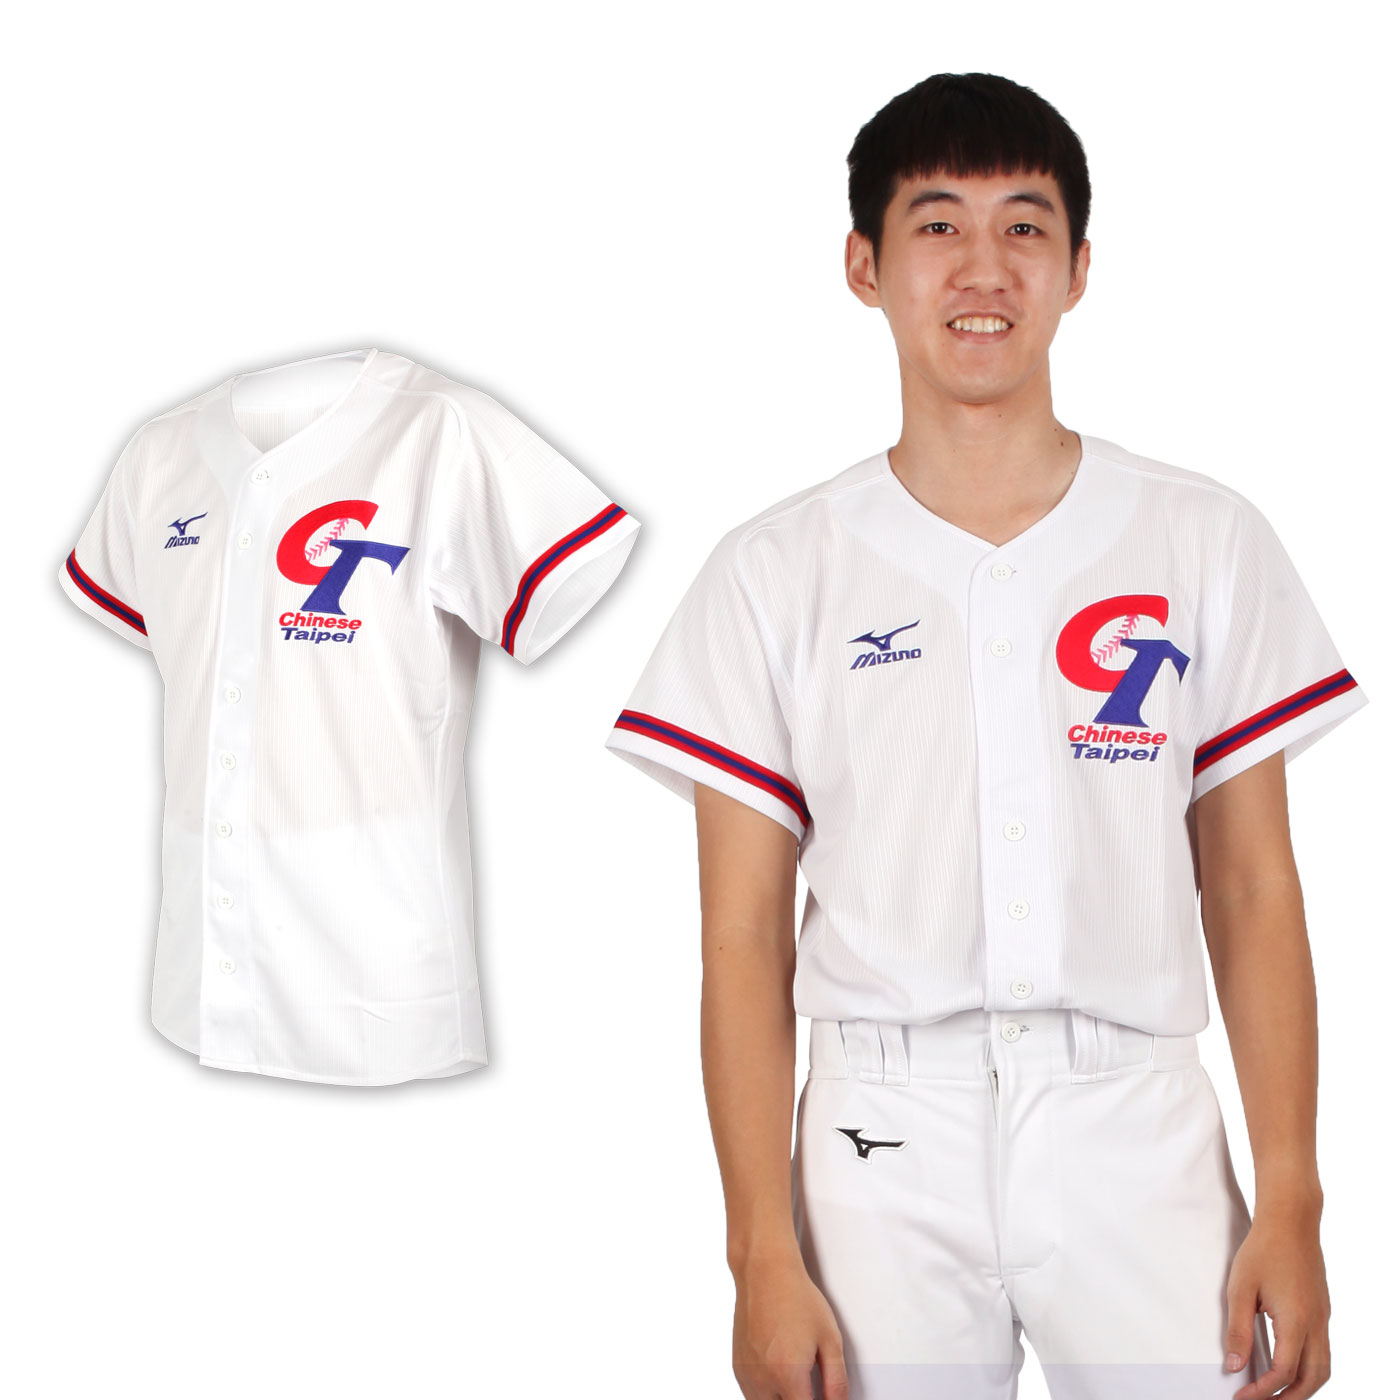 MIZUNO 男款短袖CT加油服 12TA8M0501 - 白丈青紅